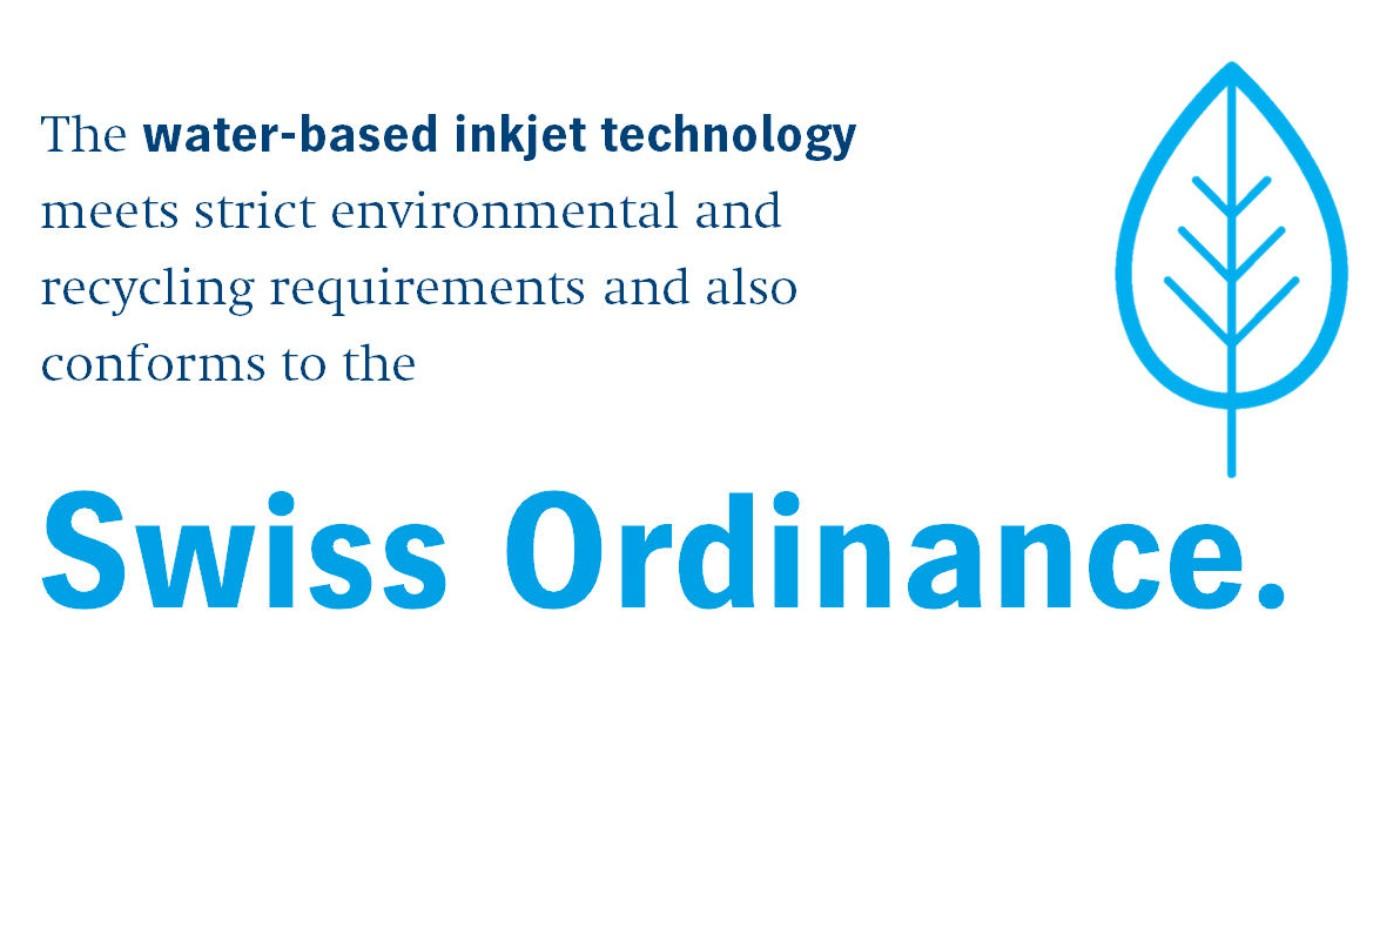 swiss_ordinance